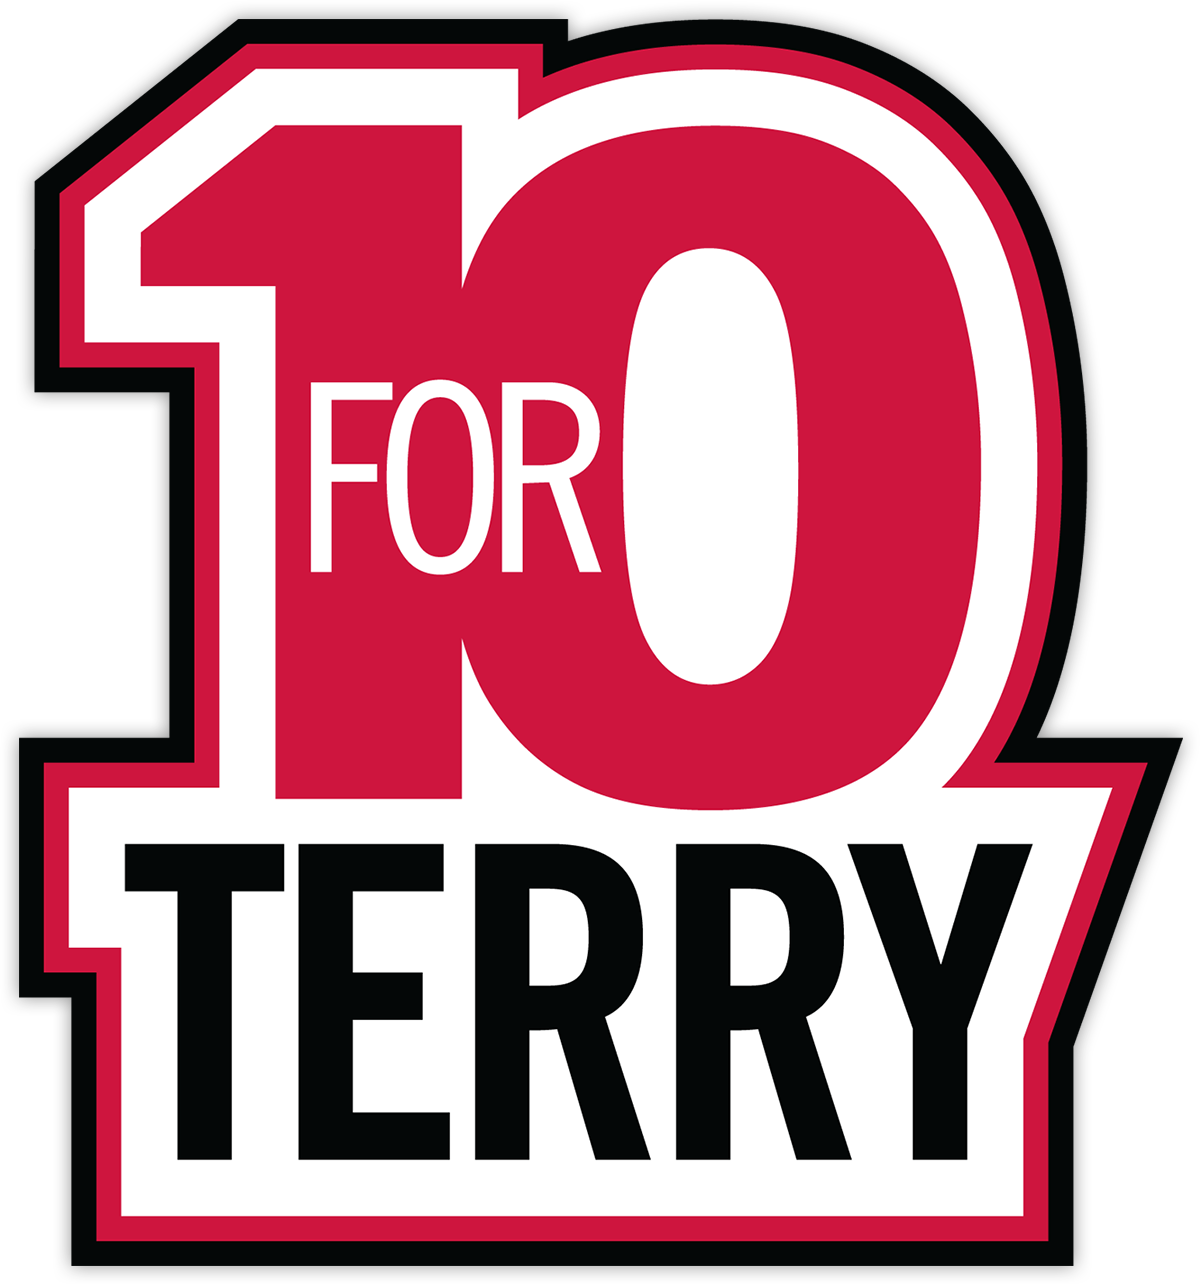 Ten for Terry